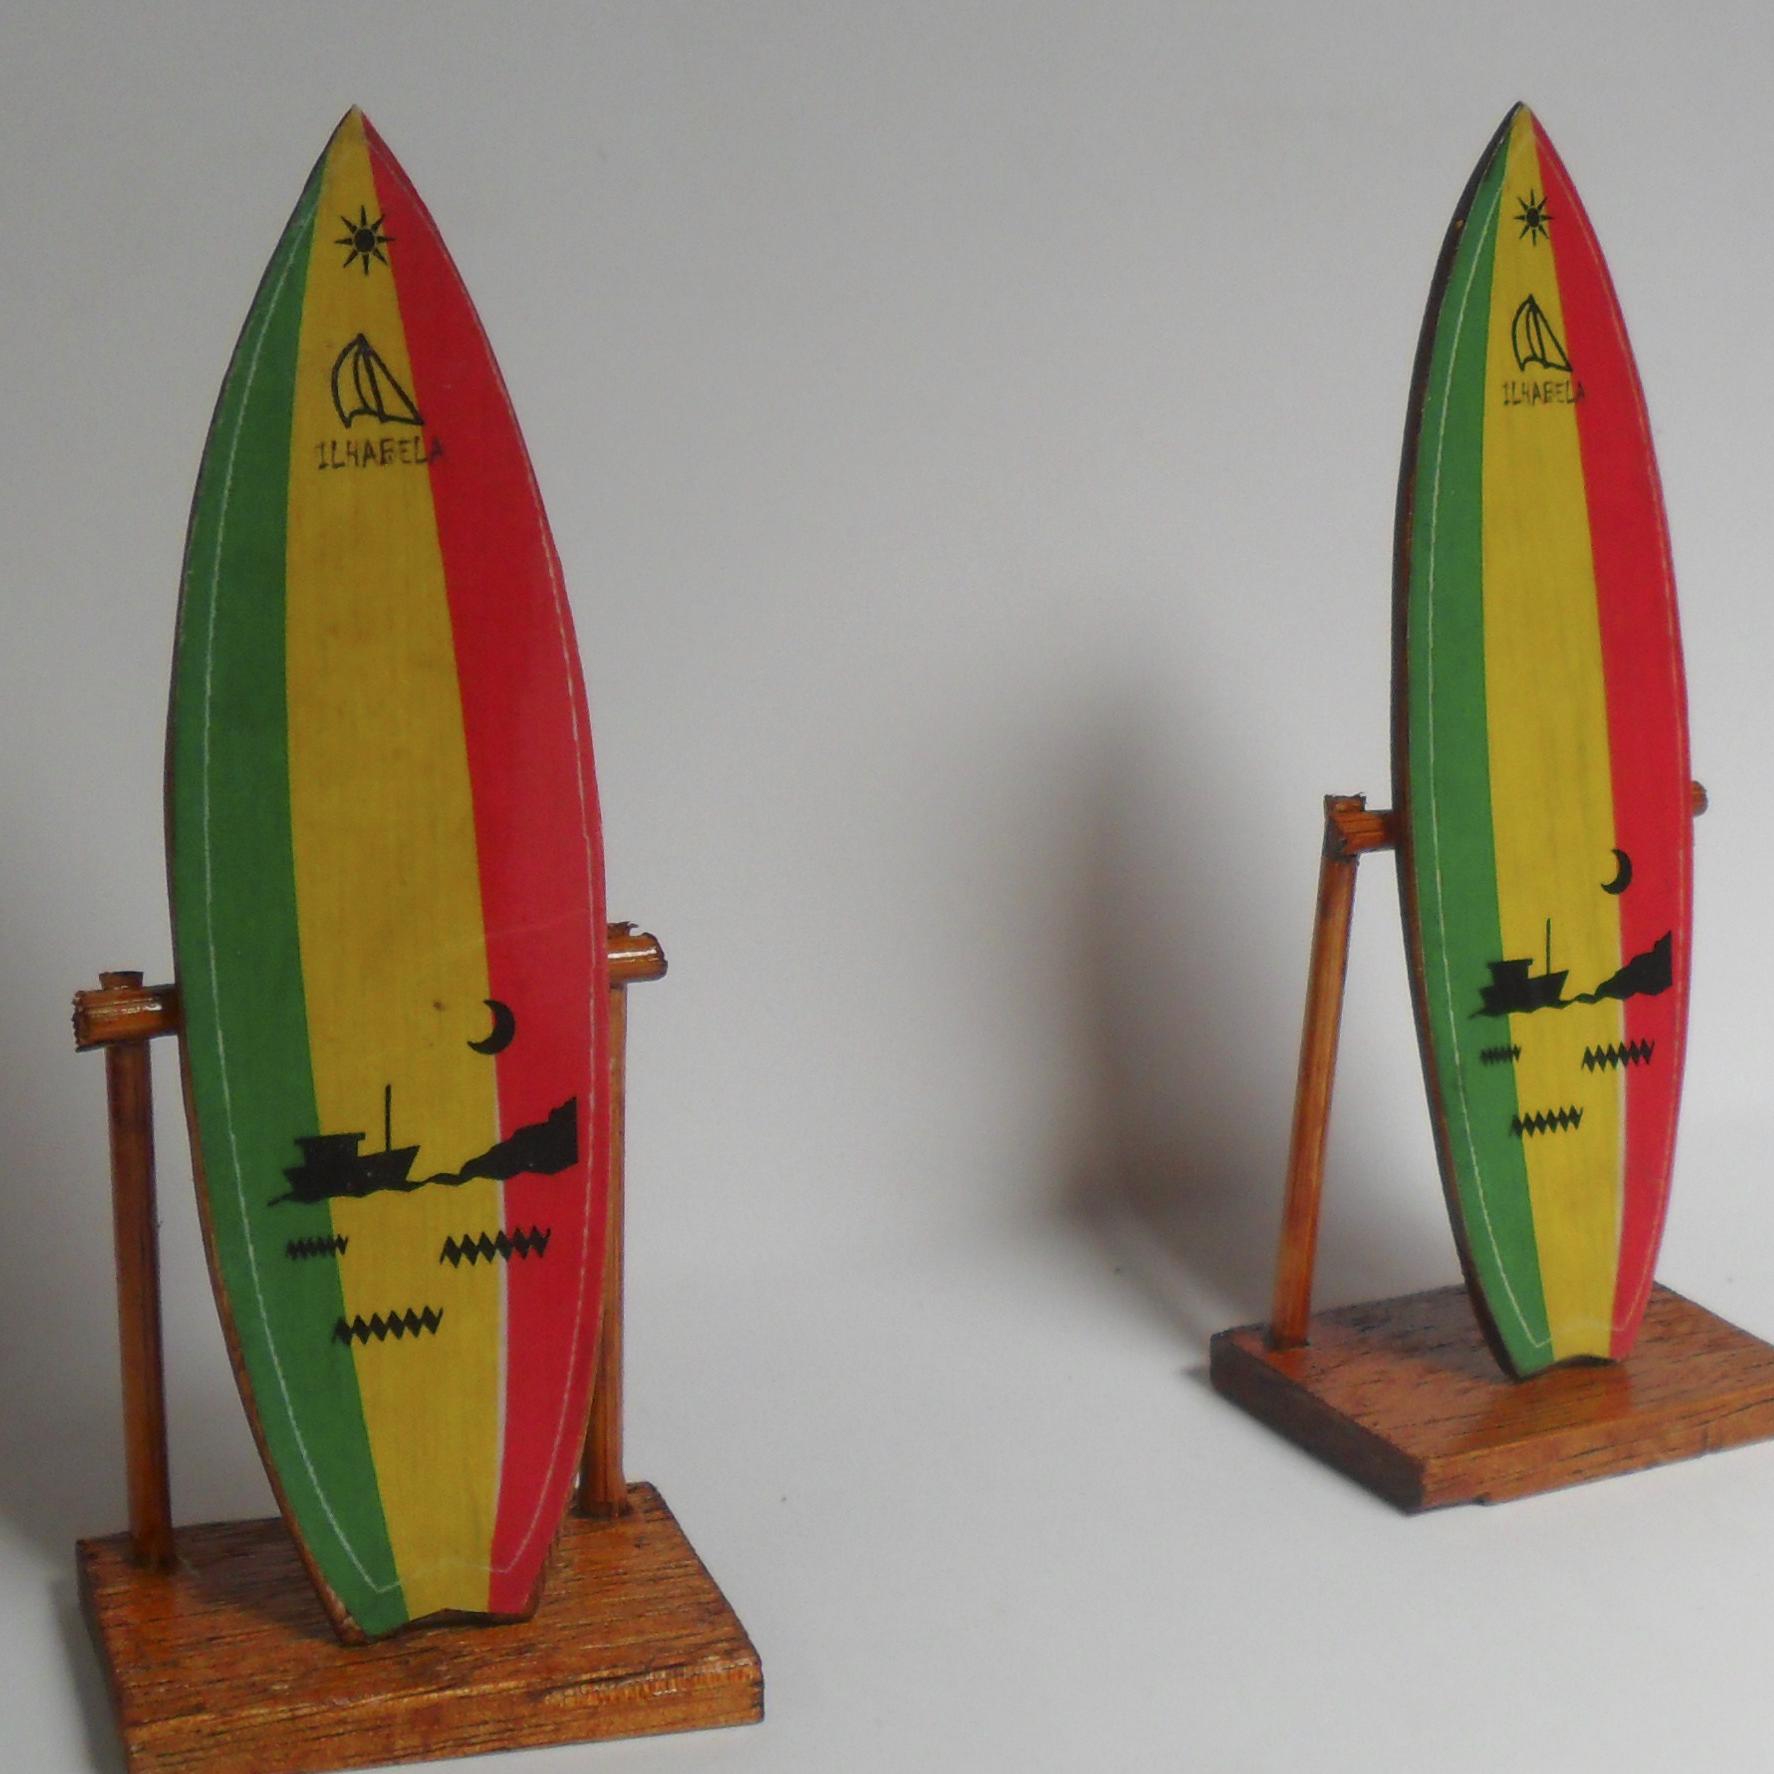 mini prancha de surf reggae decorativa no elo7 efeito wood 3bea55